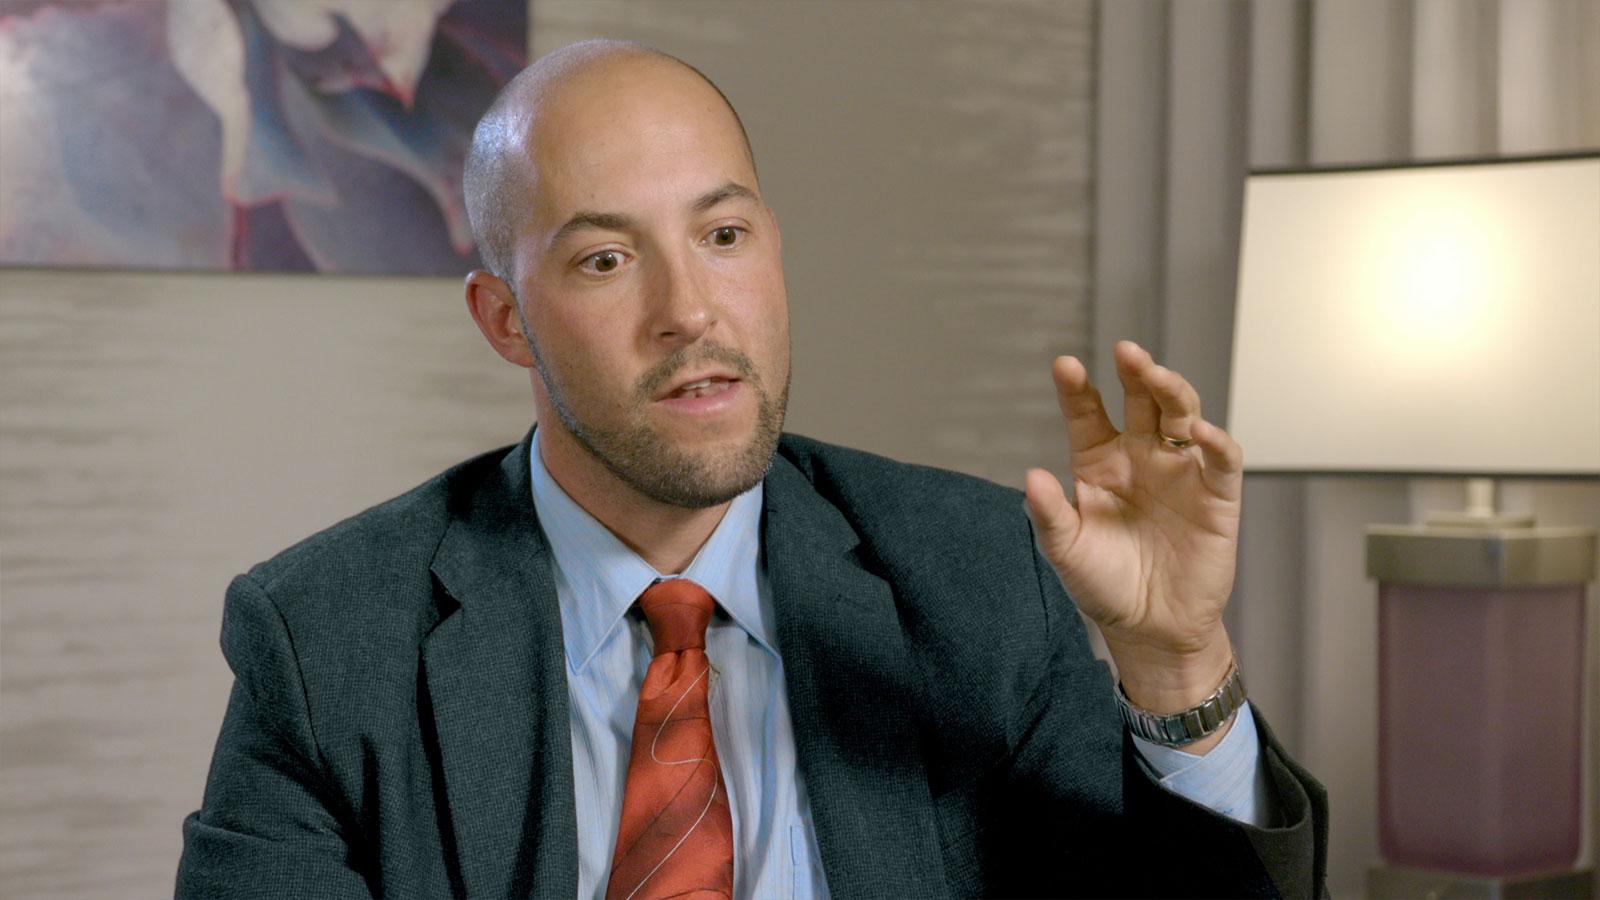 Eric Garland, Mindfulness and Integrative Medicine leader and Professor